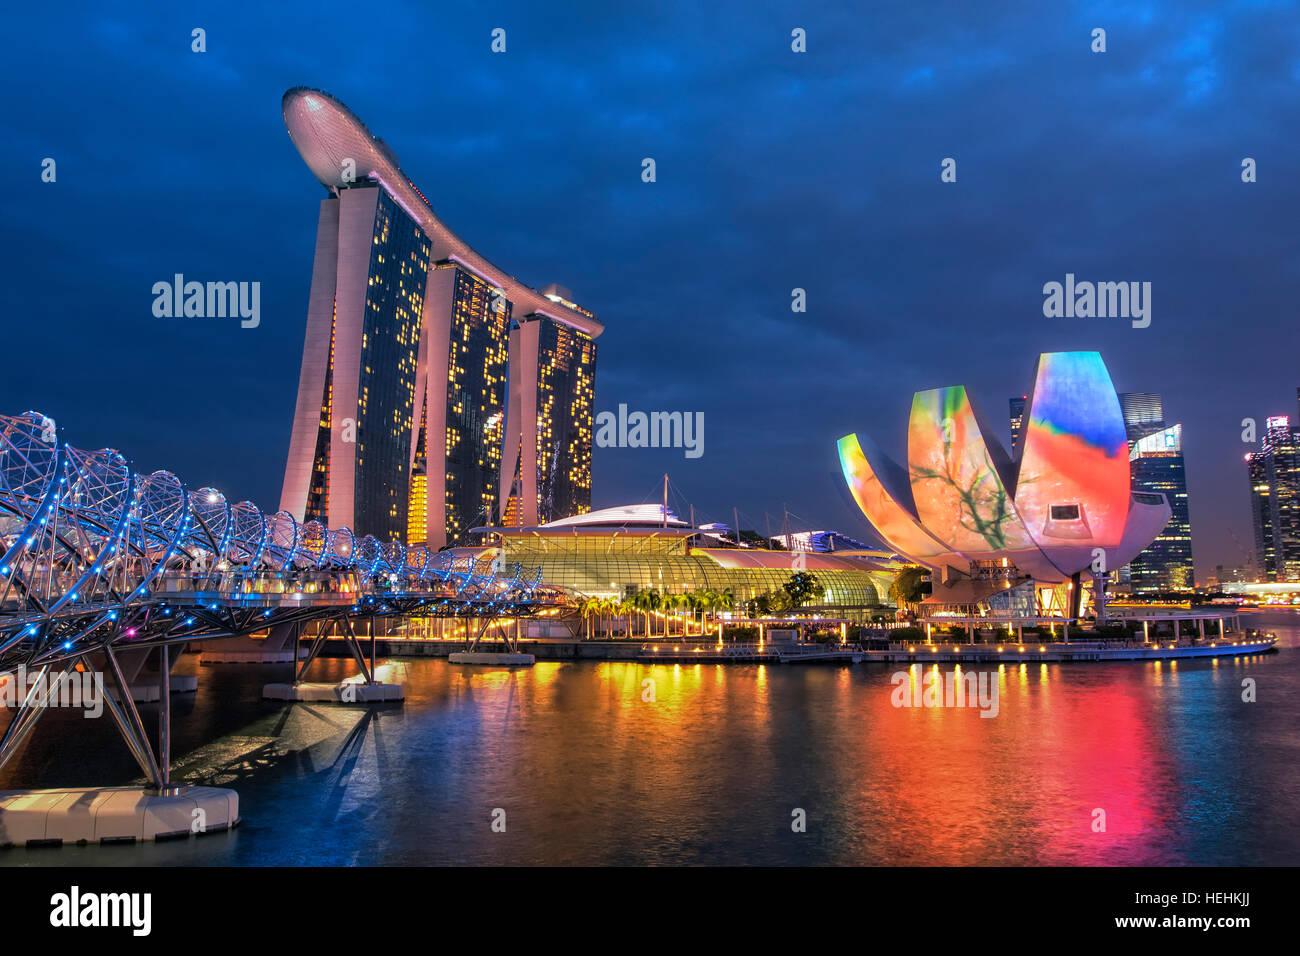 Marina Bay Sands Hotel and ArtScience museum, Singapore - Stock Image